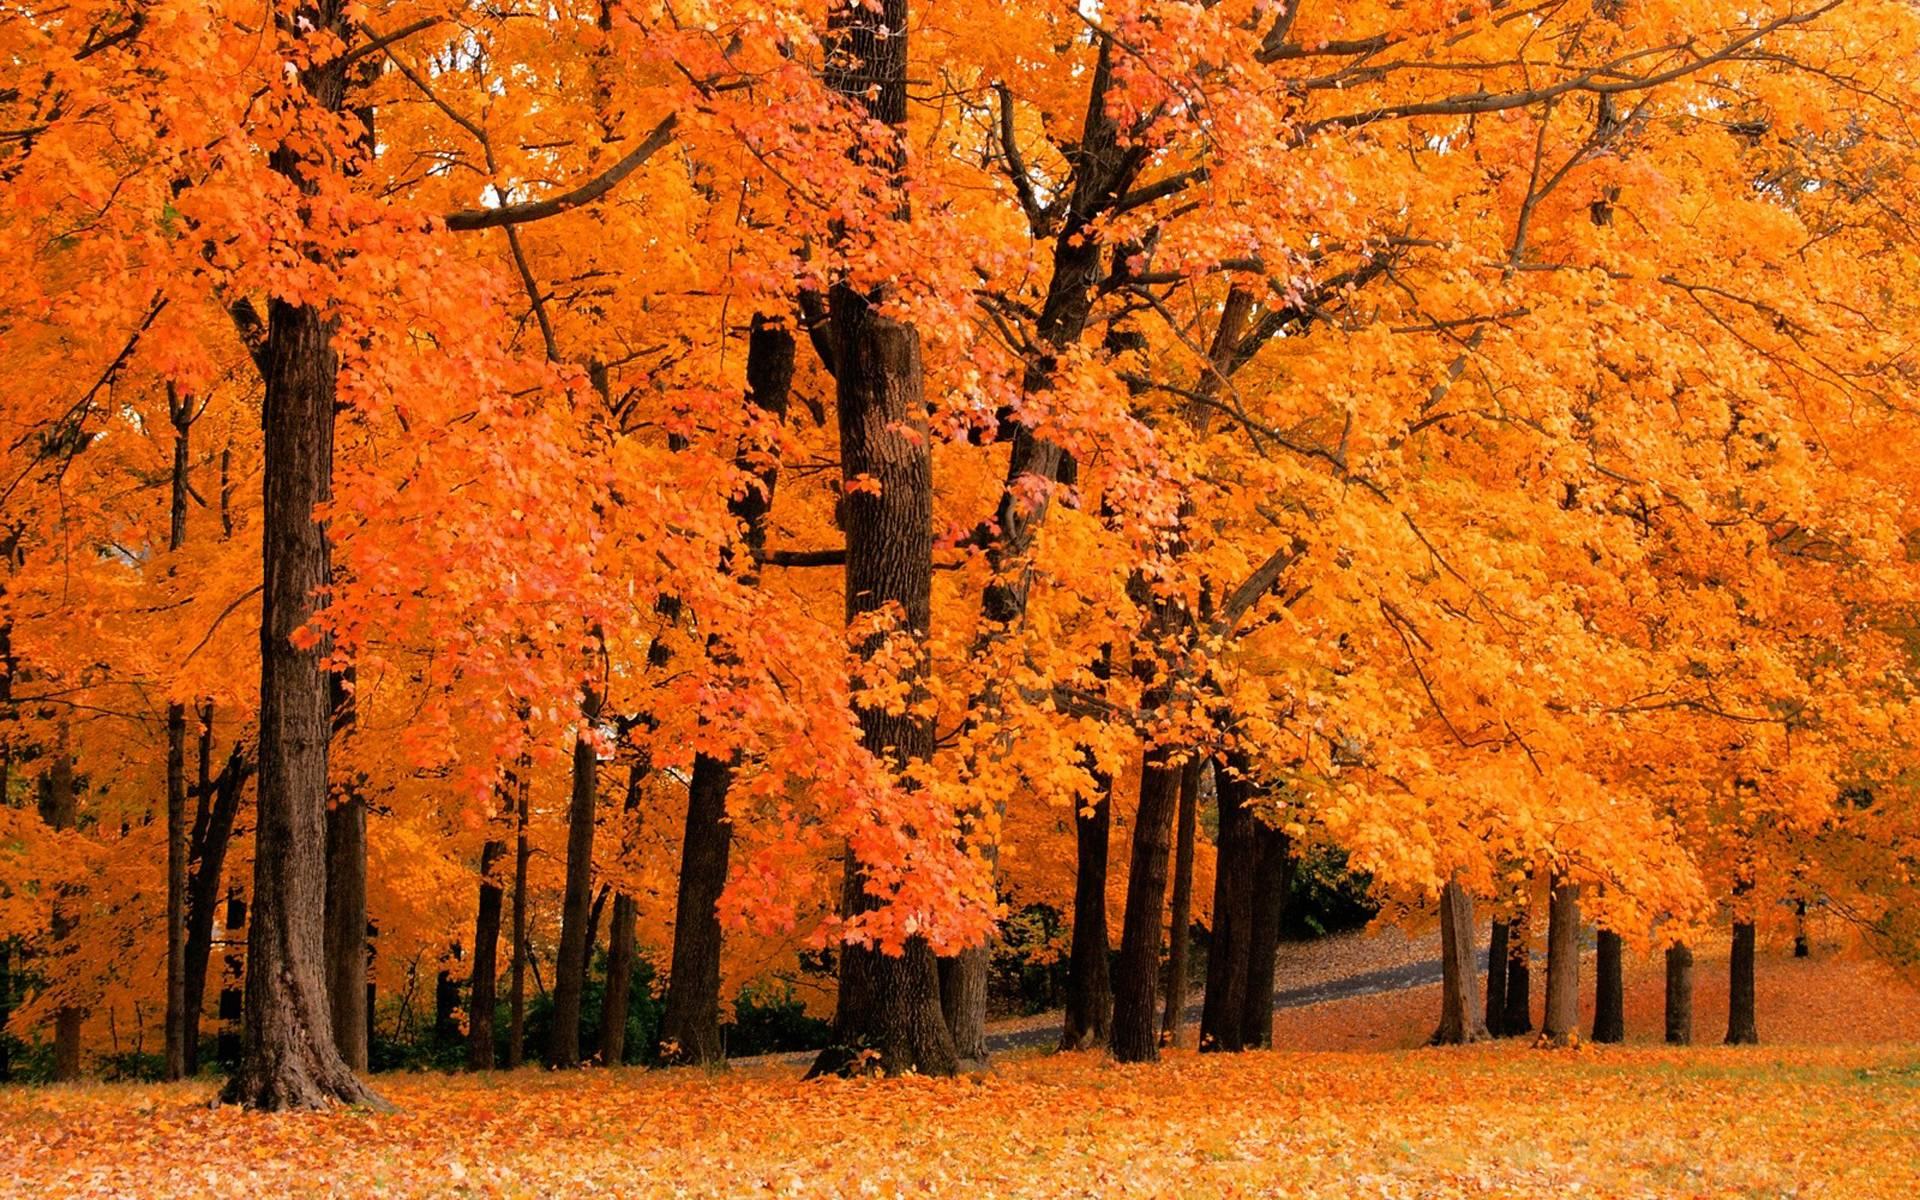 fall autumn desktop wallpaper   wwwwallpapers in hdcom 1920x1200